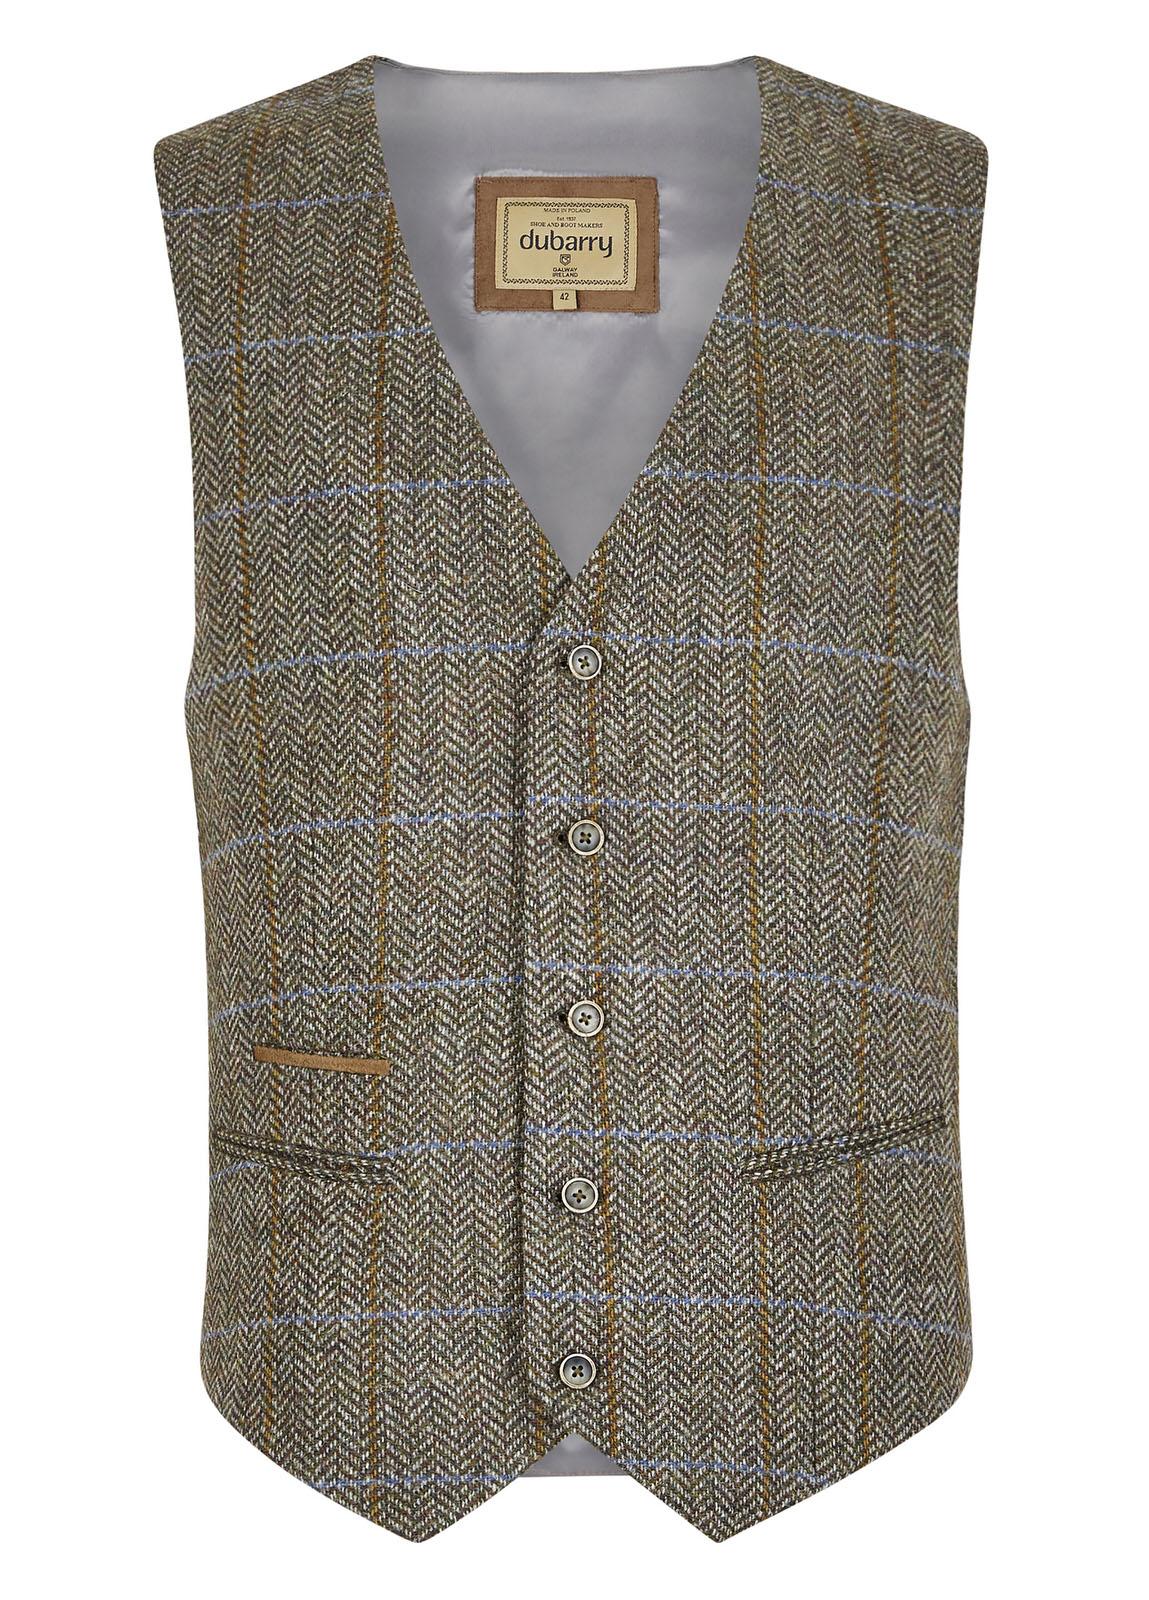 Ballyshannon_Tweed_Waistcoat_Woodbine_Image_1